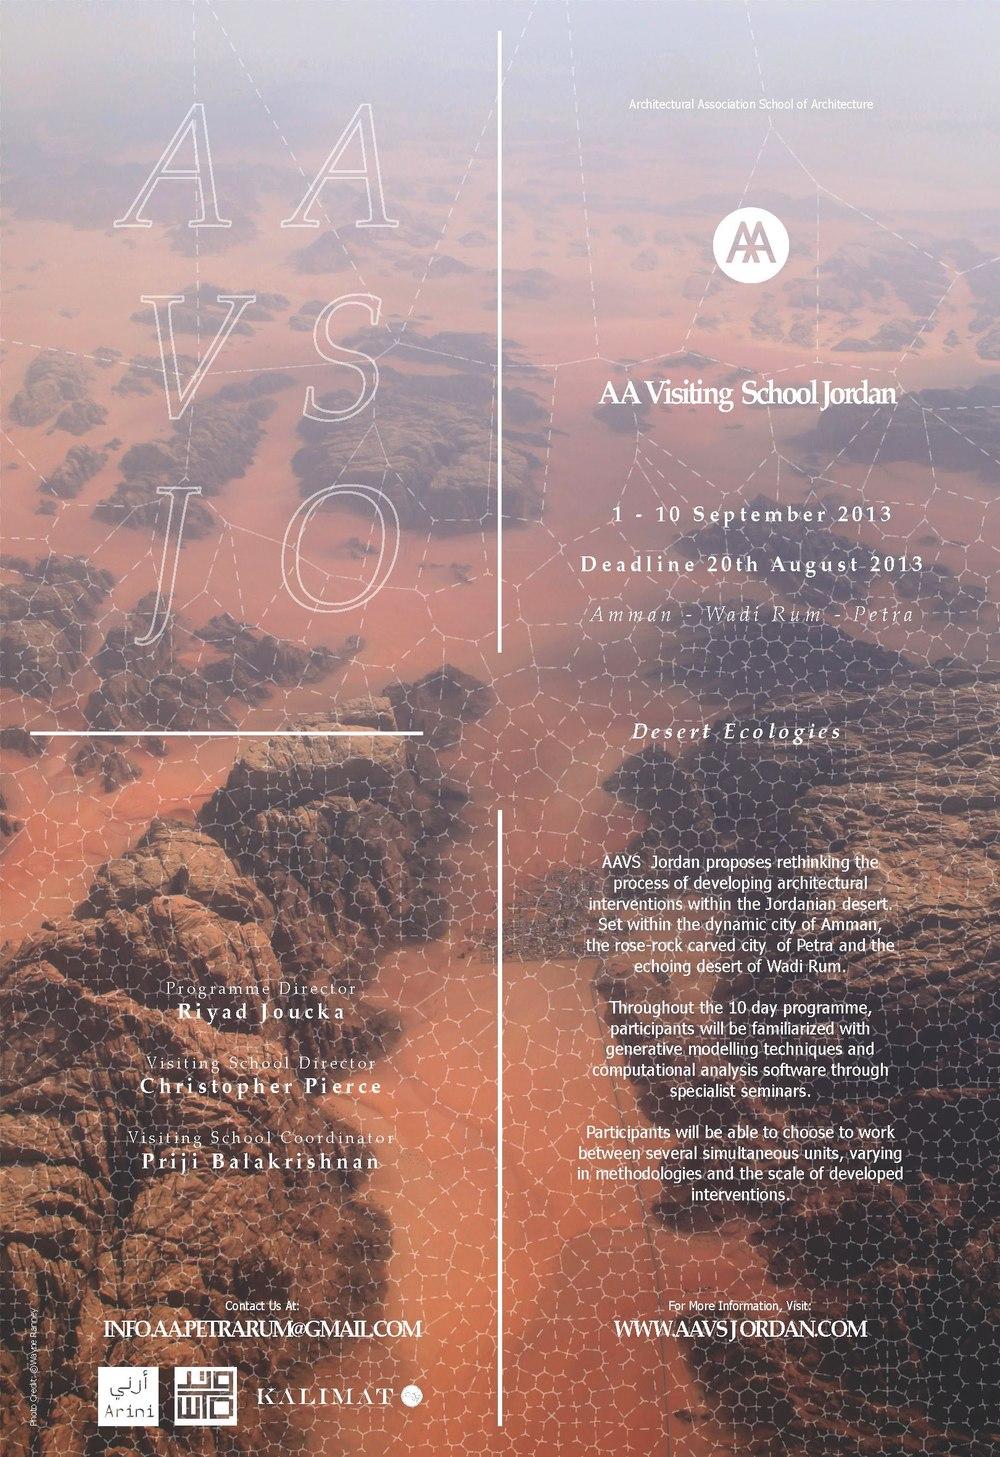 1-AAVSJORDAN_Poster_A2.jpg